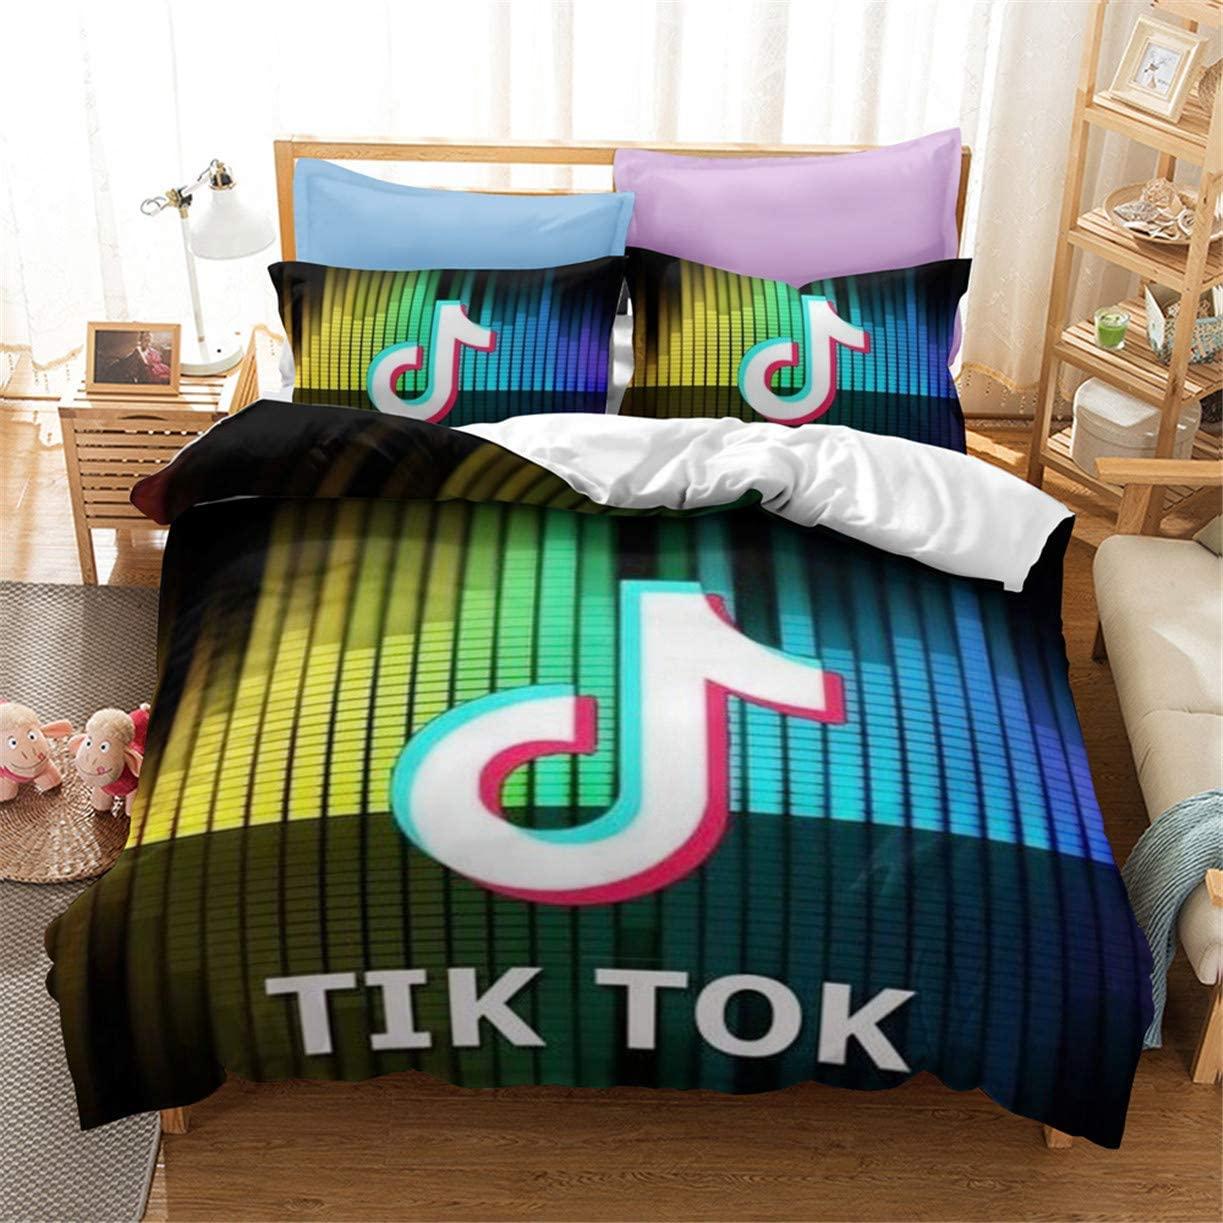 3 Pieces TIK Tok Black Bedding Set Social Media Logo Duvet Cover Set for Boys Teens 1 Duvet Cover & 2 Pillow Shams Queen Size